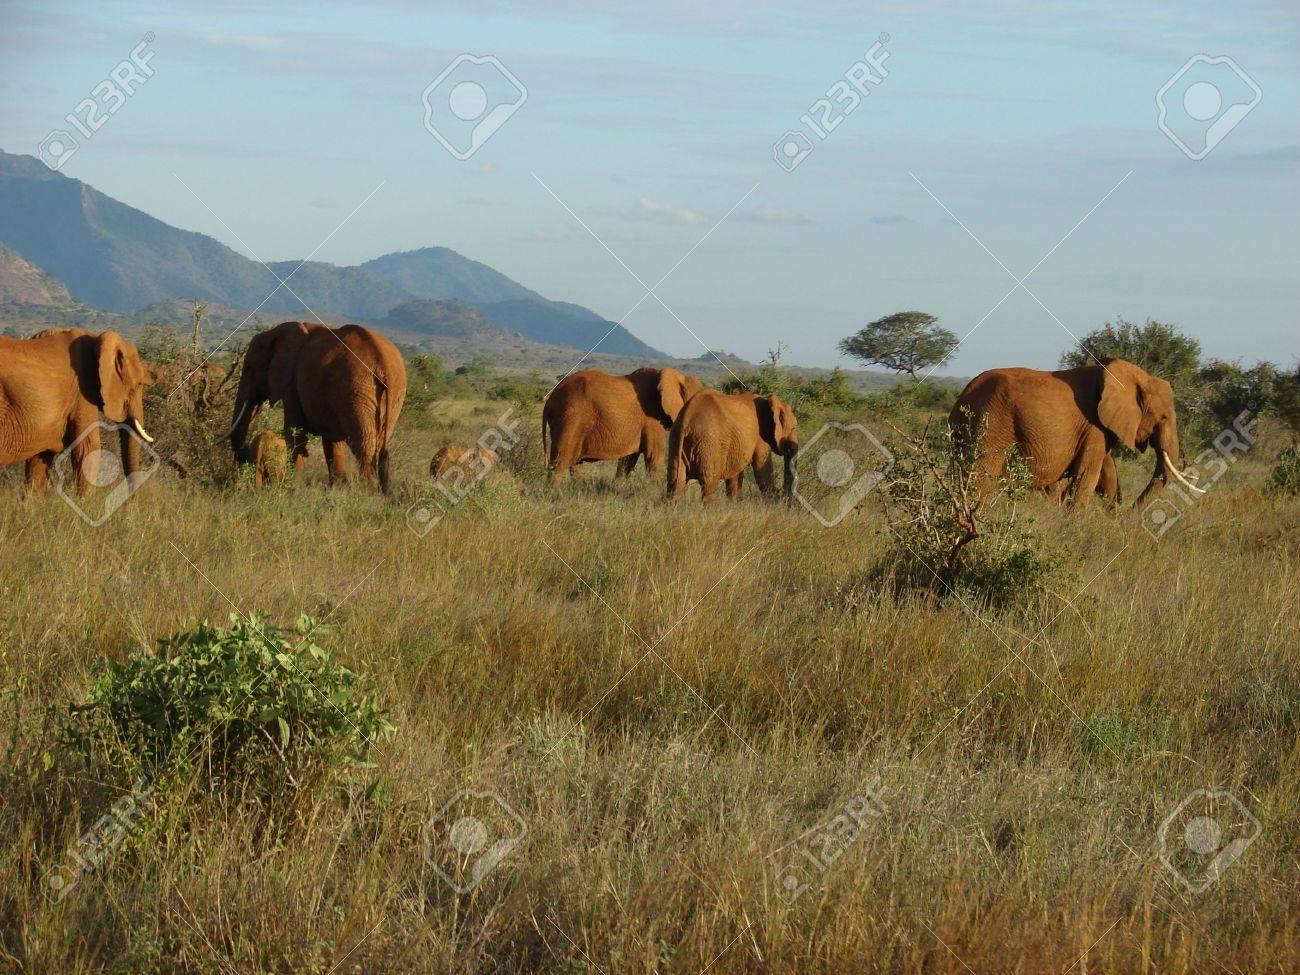 Elephants' migration through an african savanna. Tsavo National Park - Kenya Stock Photo - 3824111